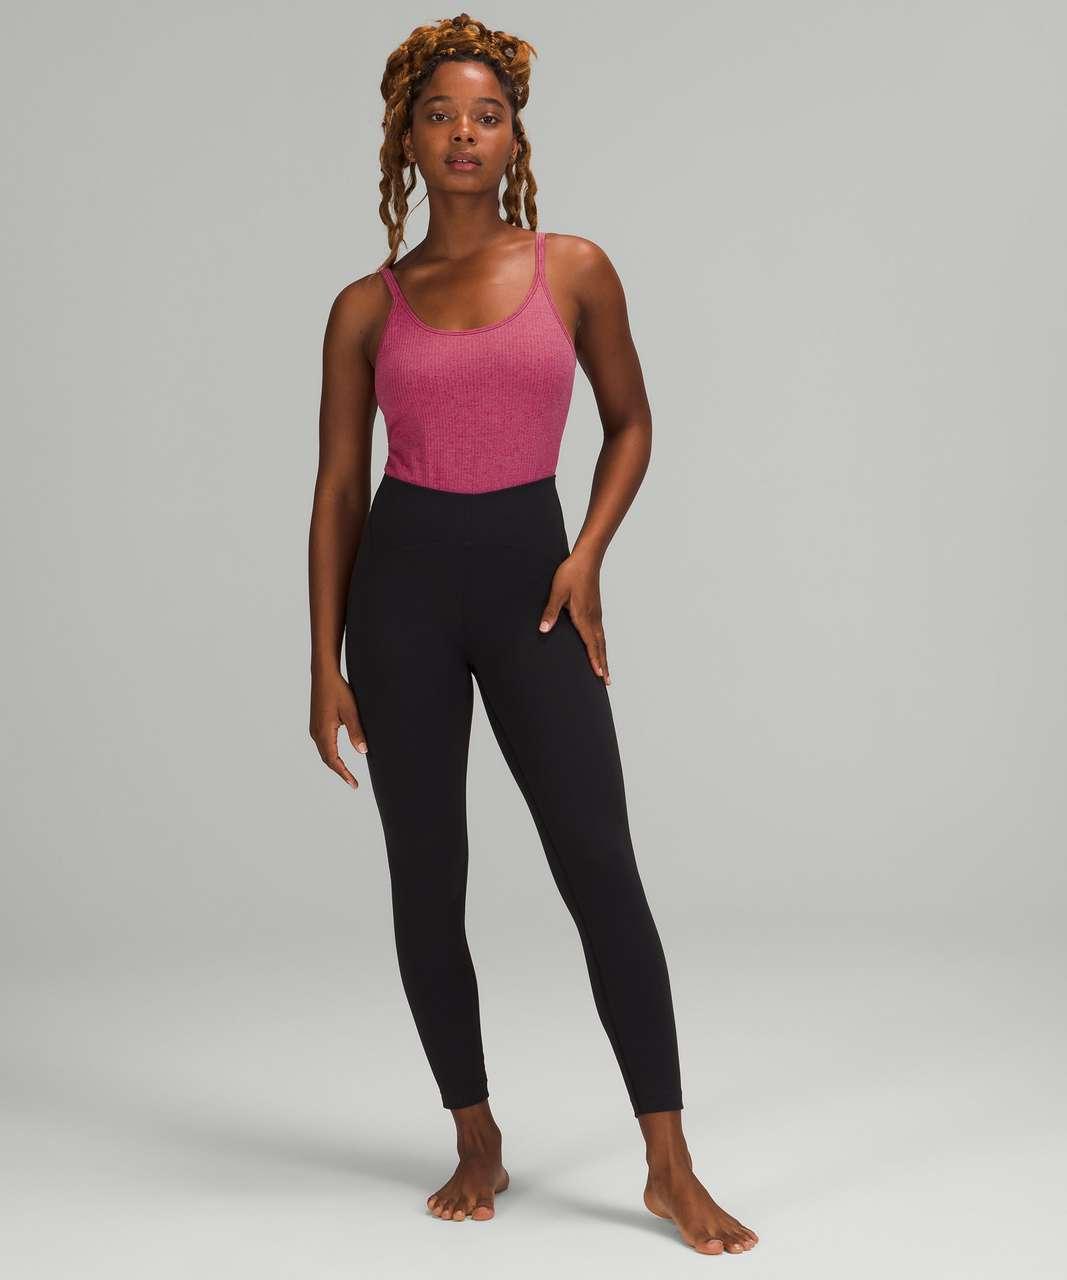 Lululemon Ebb to Street Bodysuit *Light Support, B/C Cups - Pink Lychee